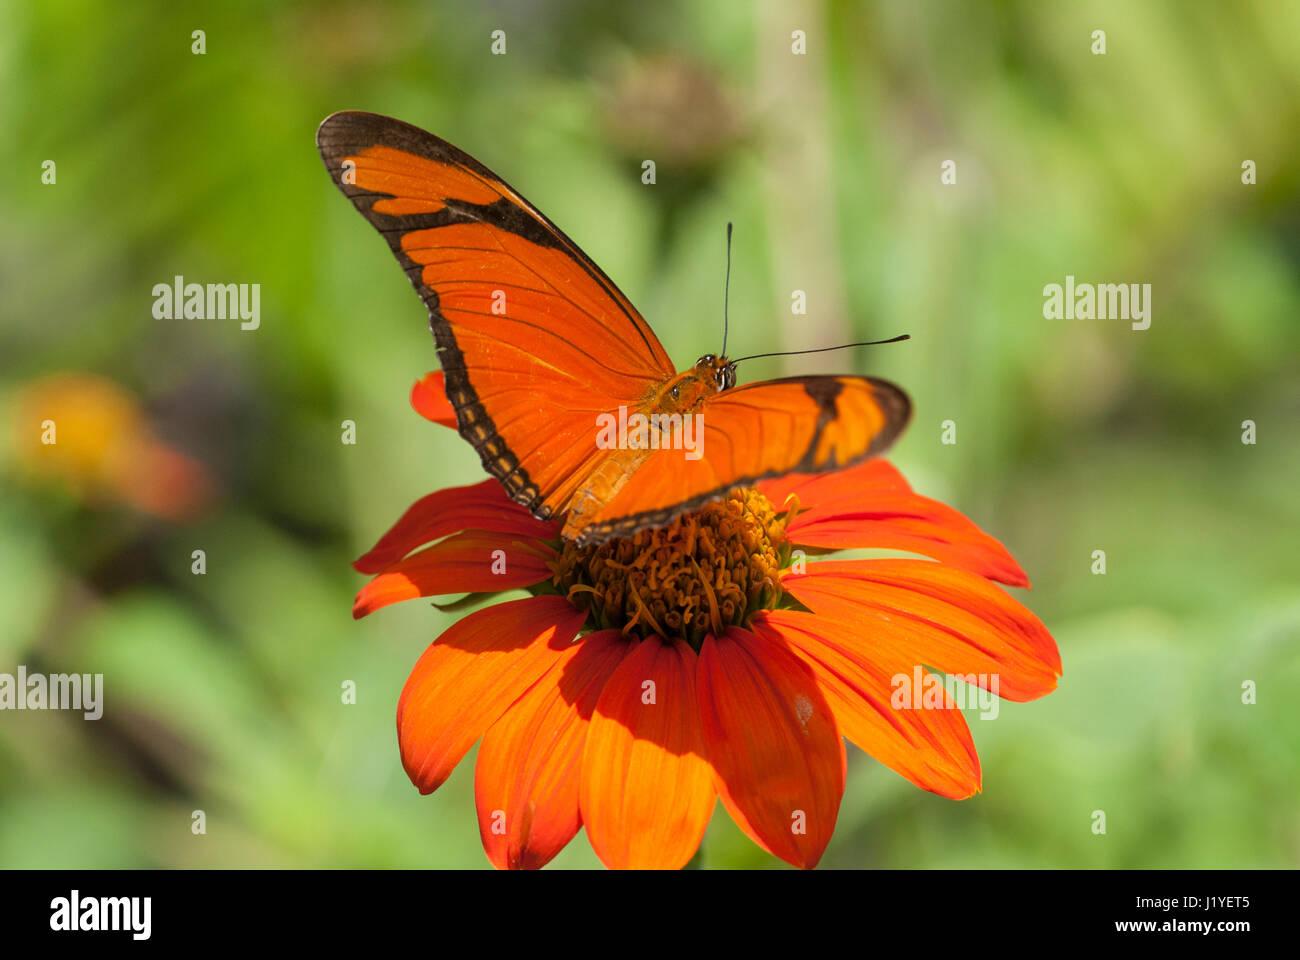 Julia butterfly (Dryas iulia) feeding on nectar from an orange coloured flower - Stock Image